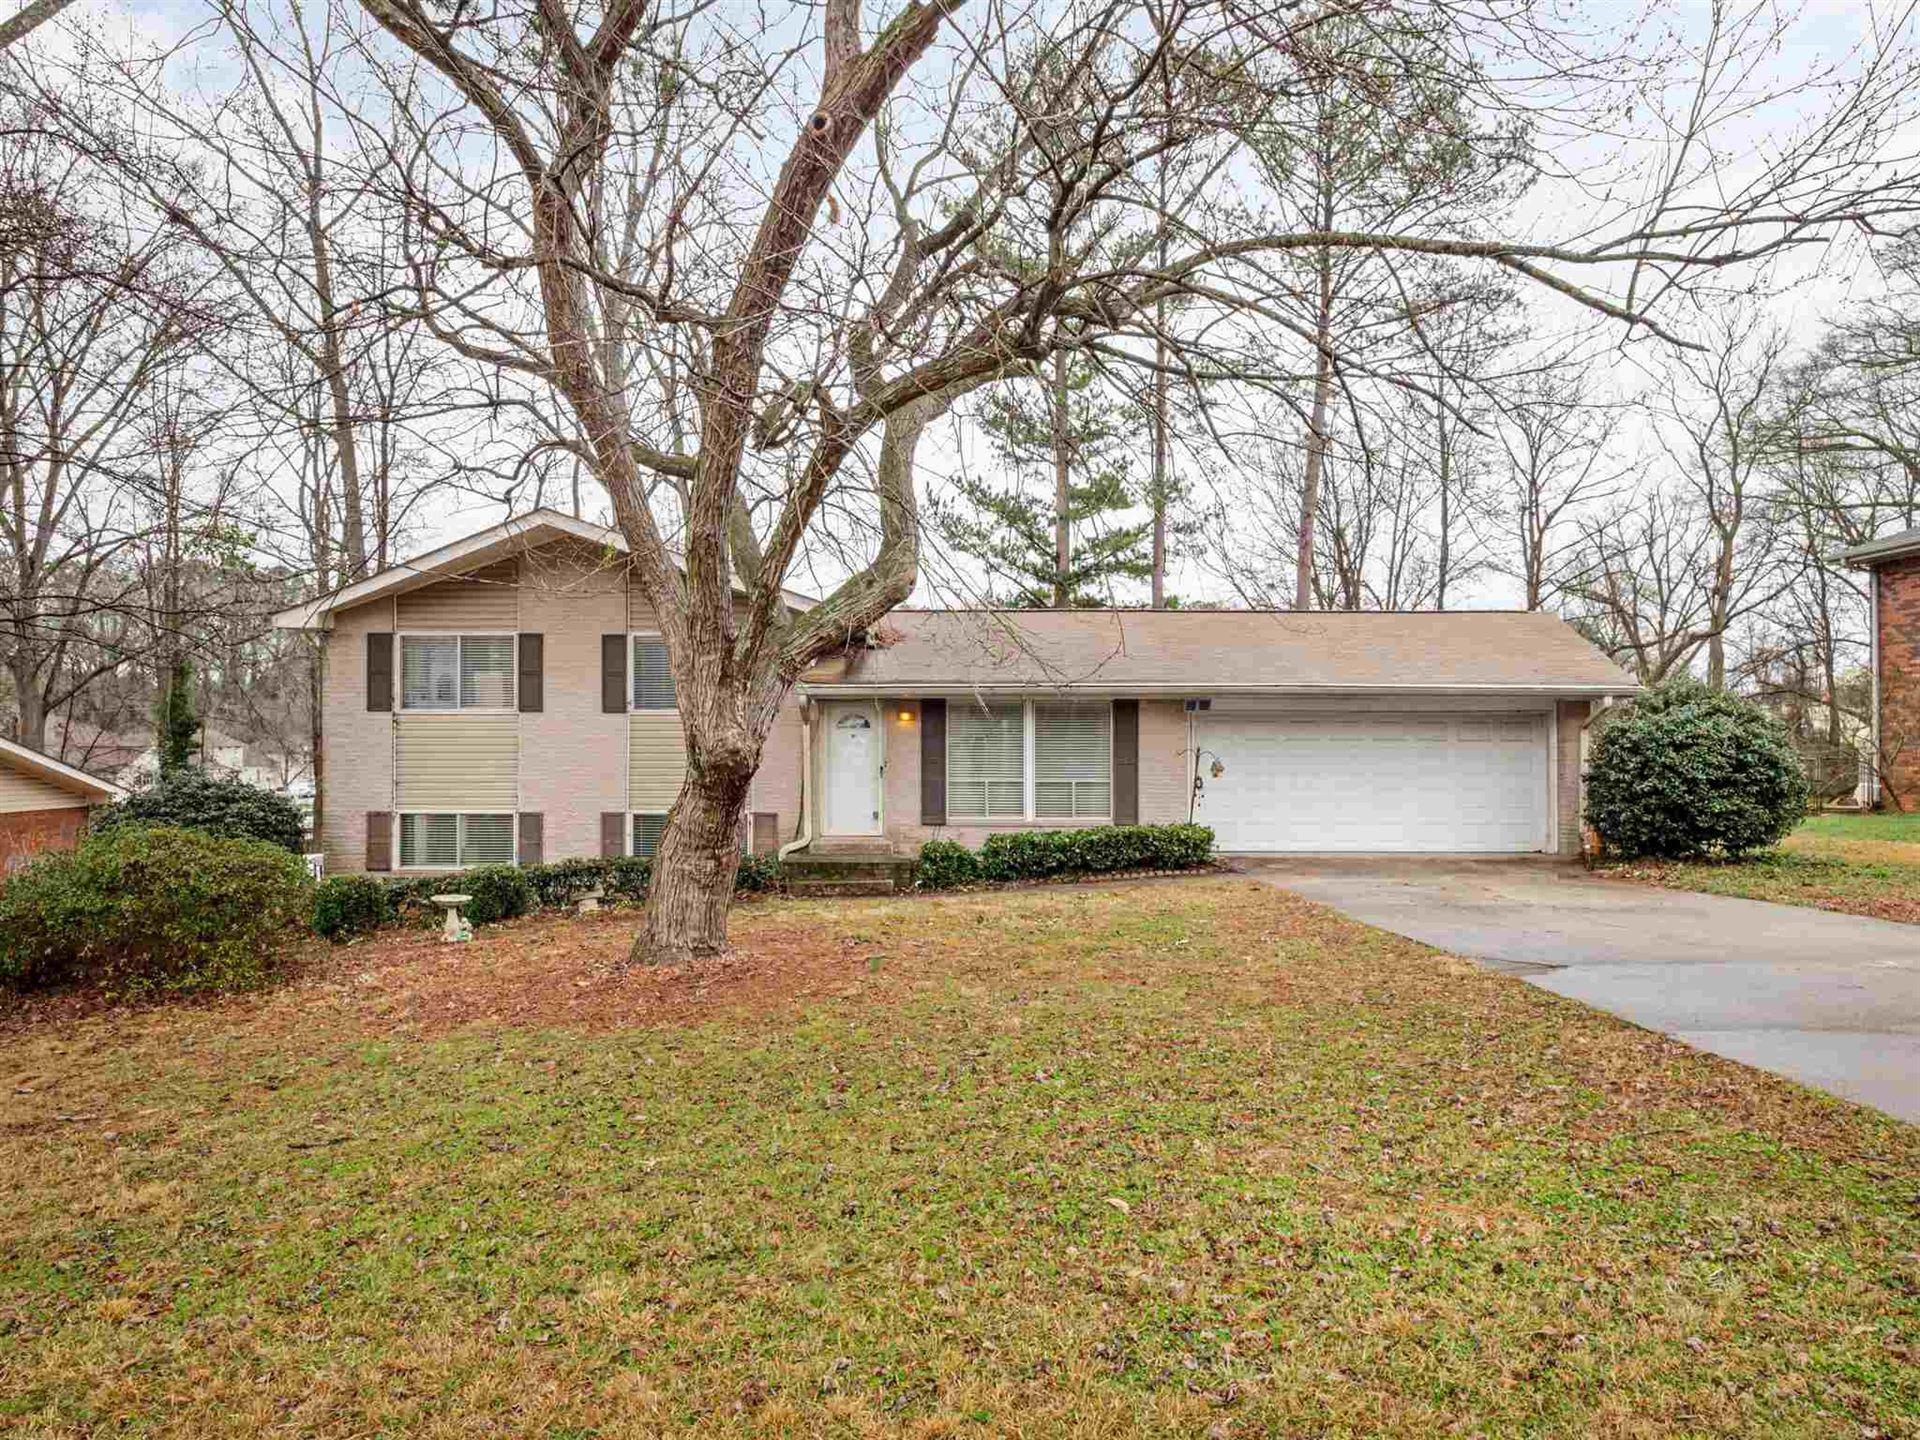 103 Parkwood Drive, Stockbridge, GA 30281 - MLS#: 8916872